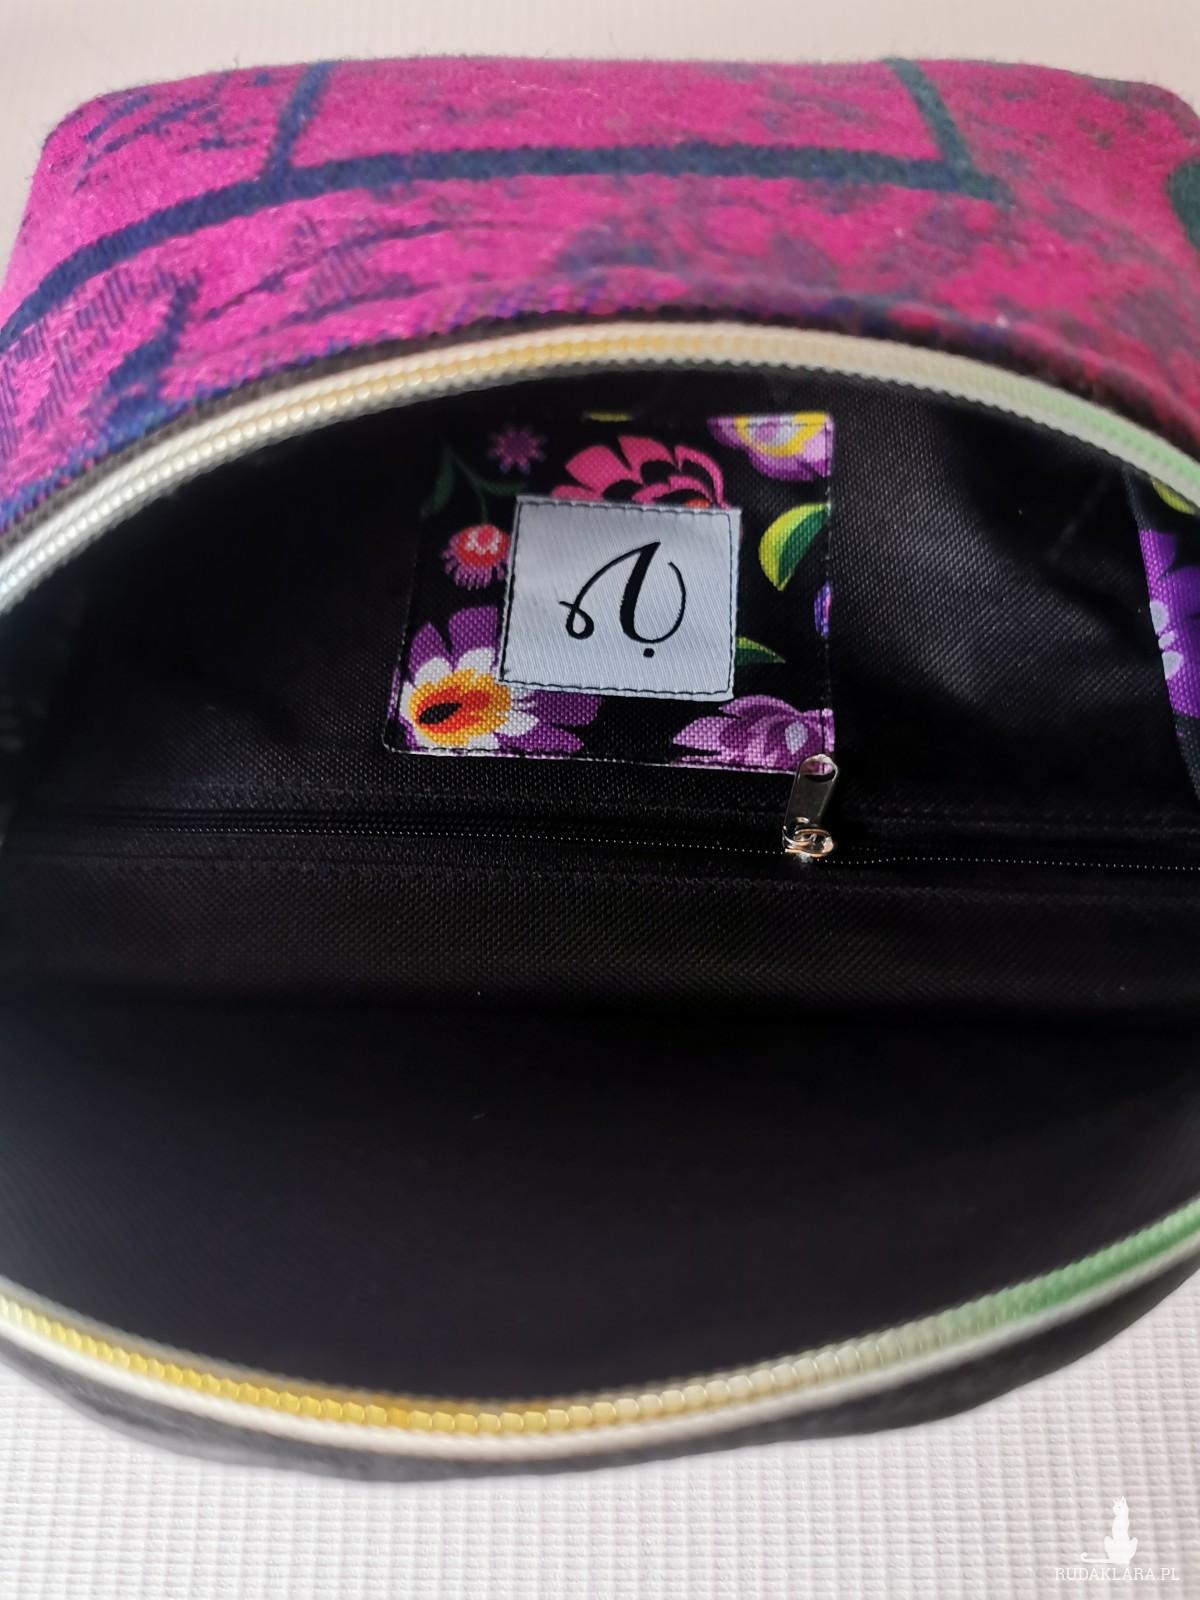 Nerka saszetka biodrowa wodoodporna handmade torebka na pas torebka na ramię mini torebka ekoskóra chusta Symfonia - Pragnienie  rozmiar L